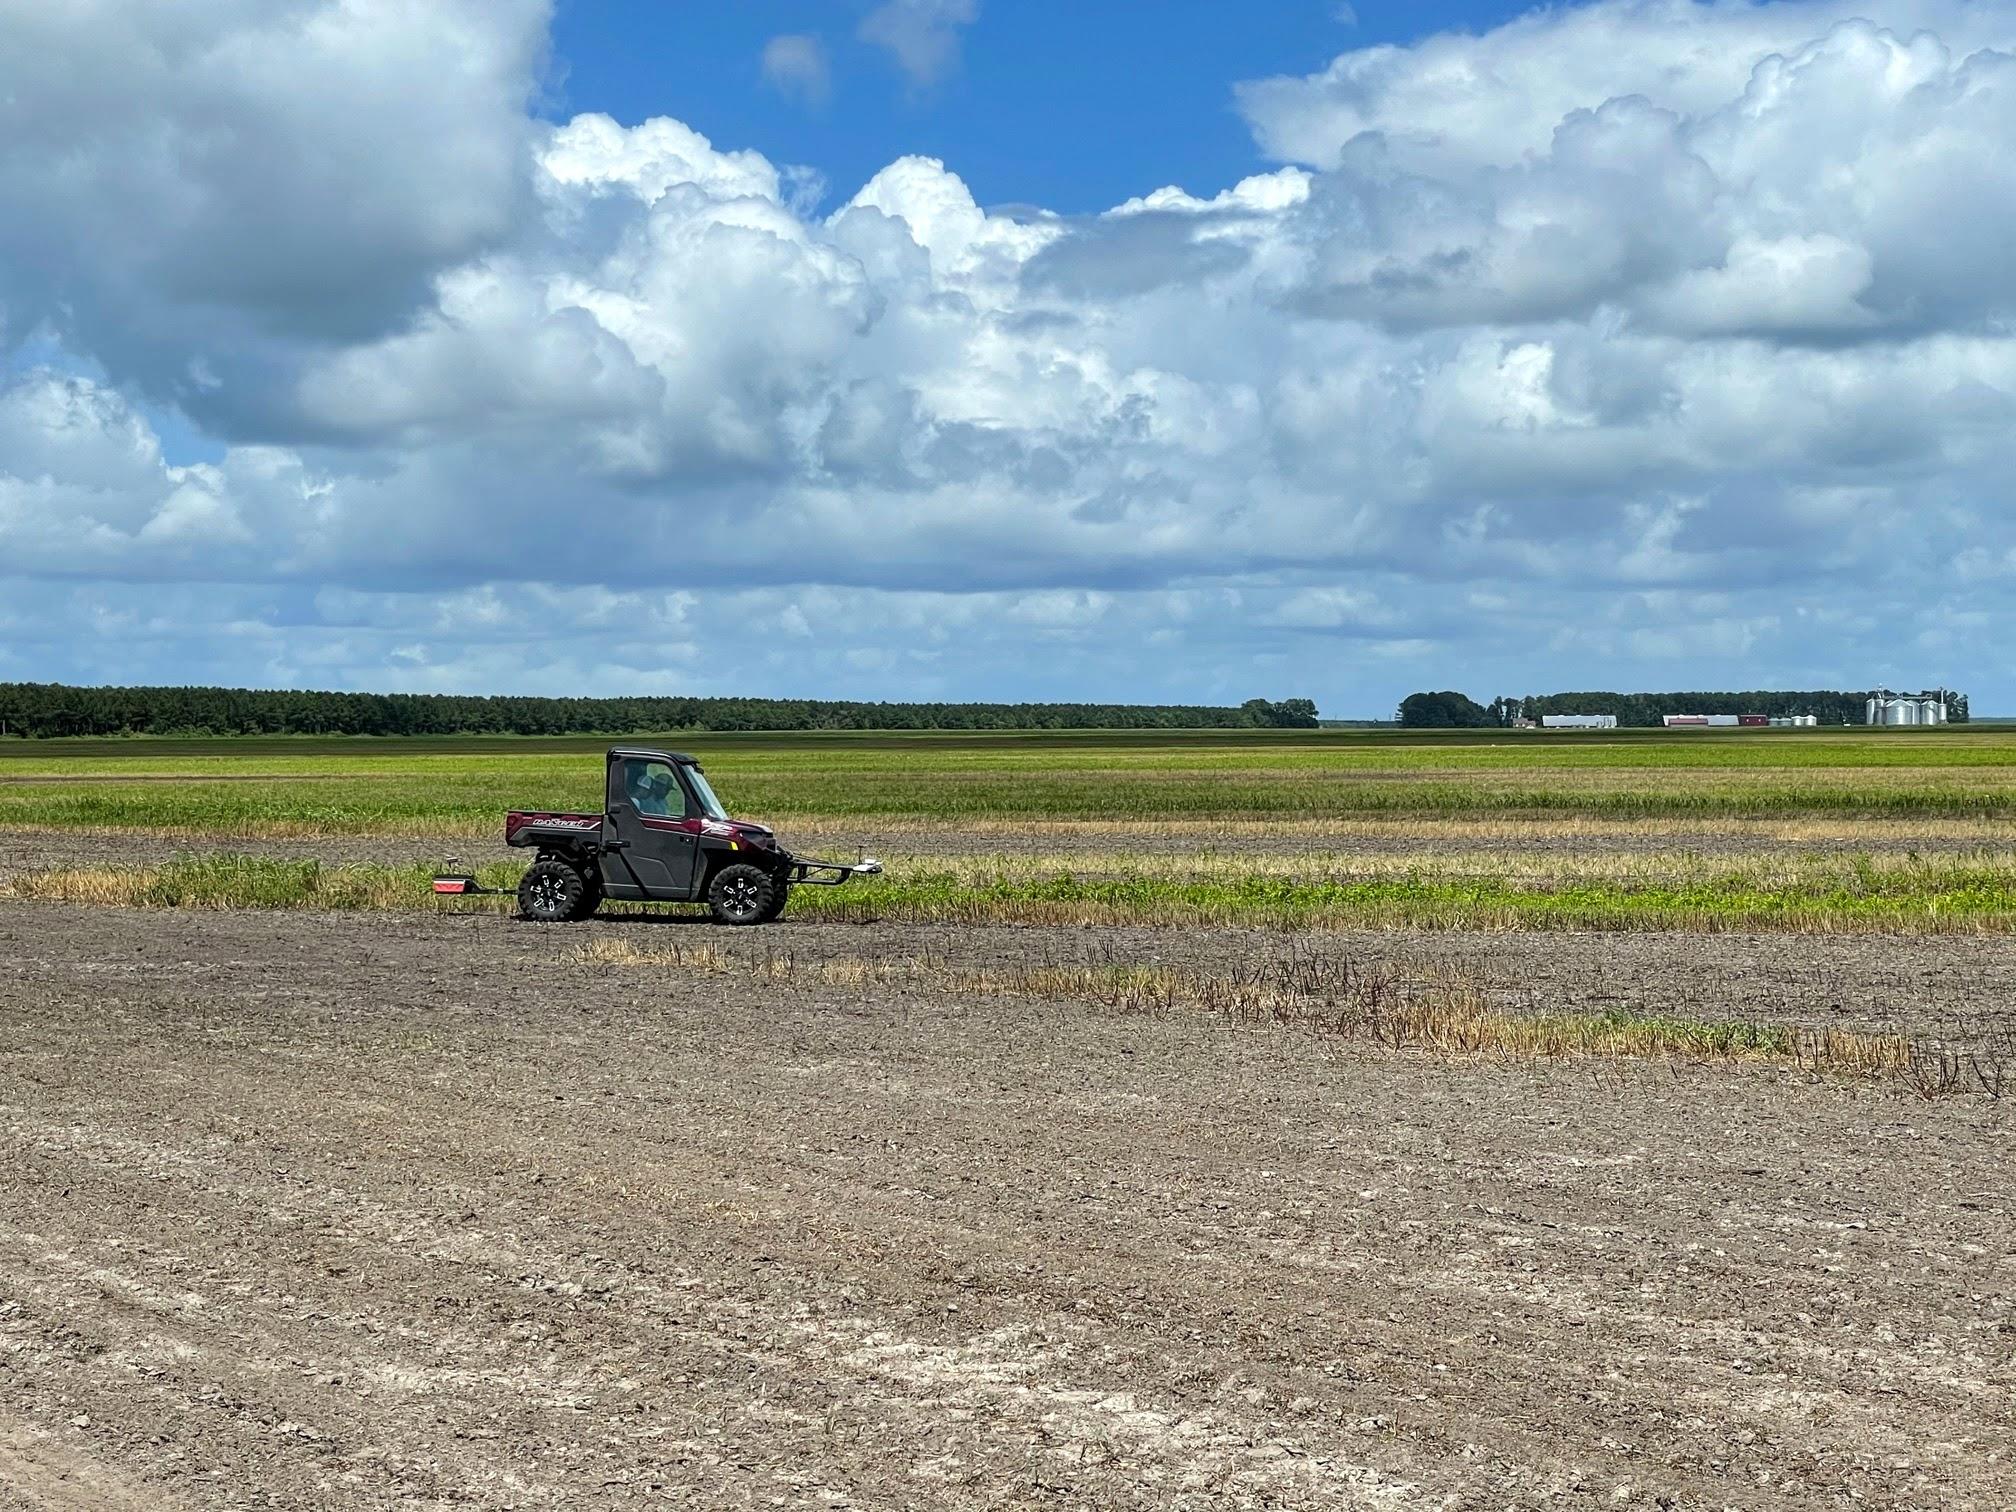 EarthOptics helps farmers look deep into the soil for big data insights